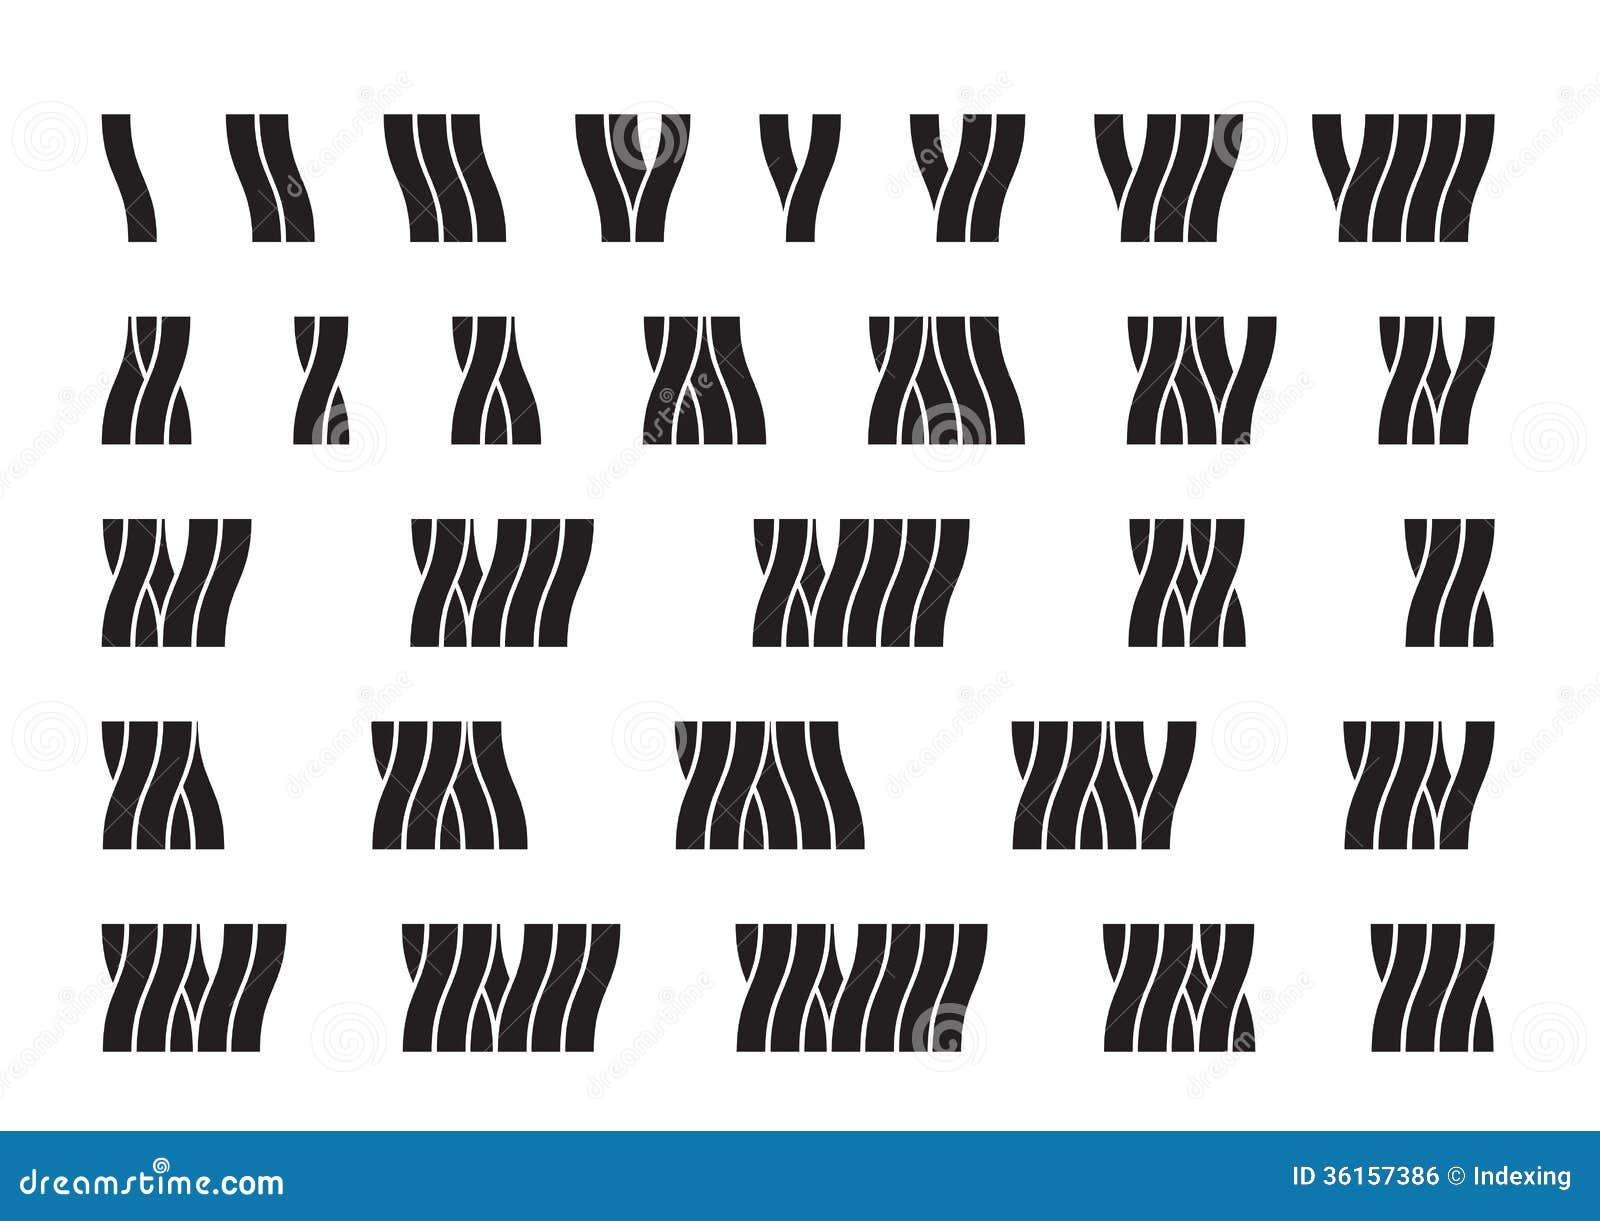 Roman numerals I - XXX Tree-like font Dendroid font Wavy liquid font ...